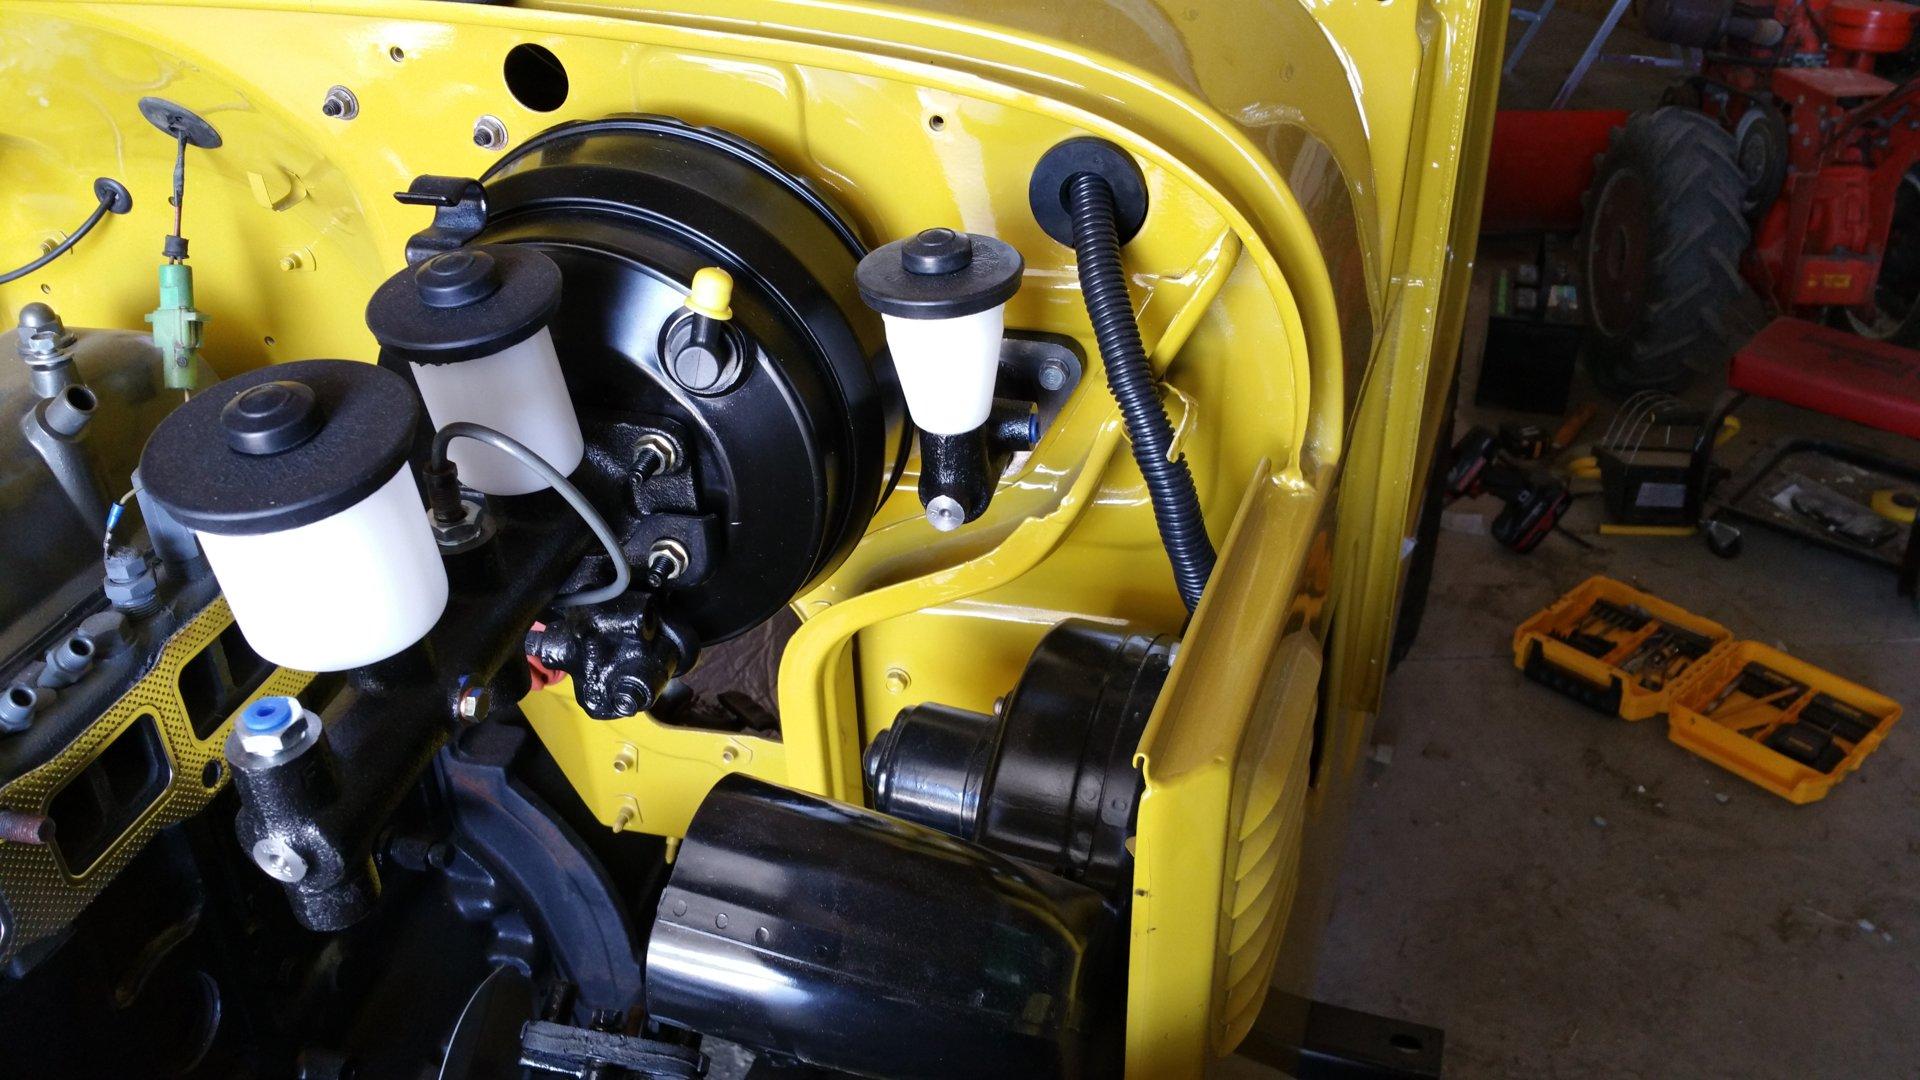 1978 fj40 master cylinder.jpg